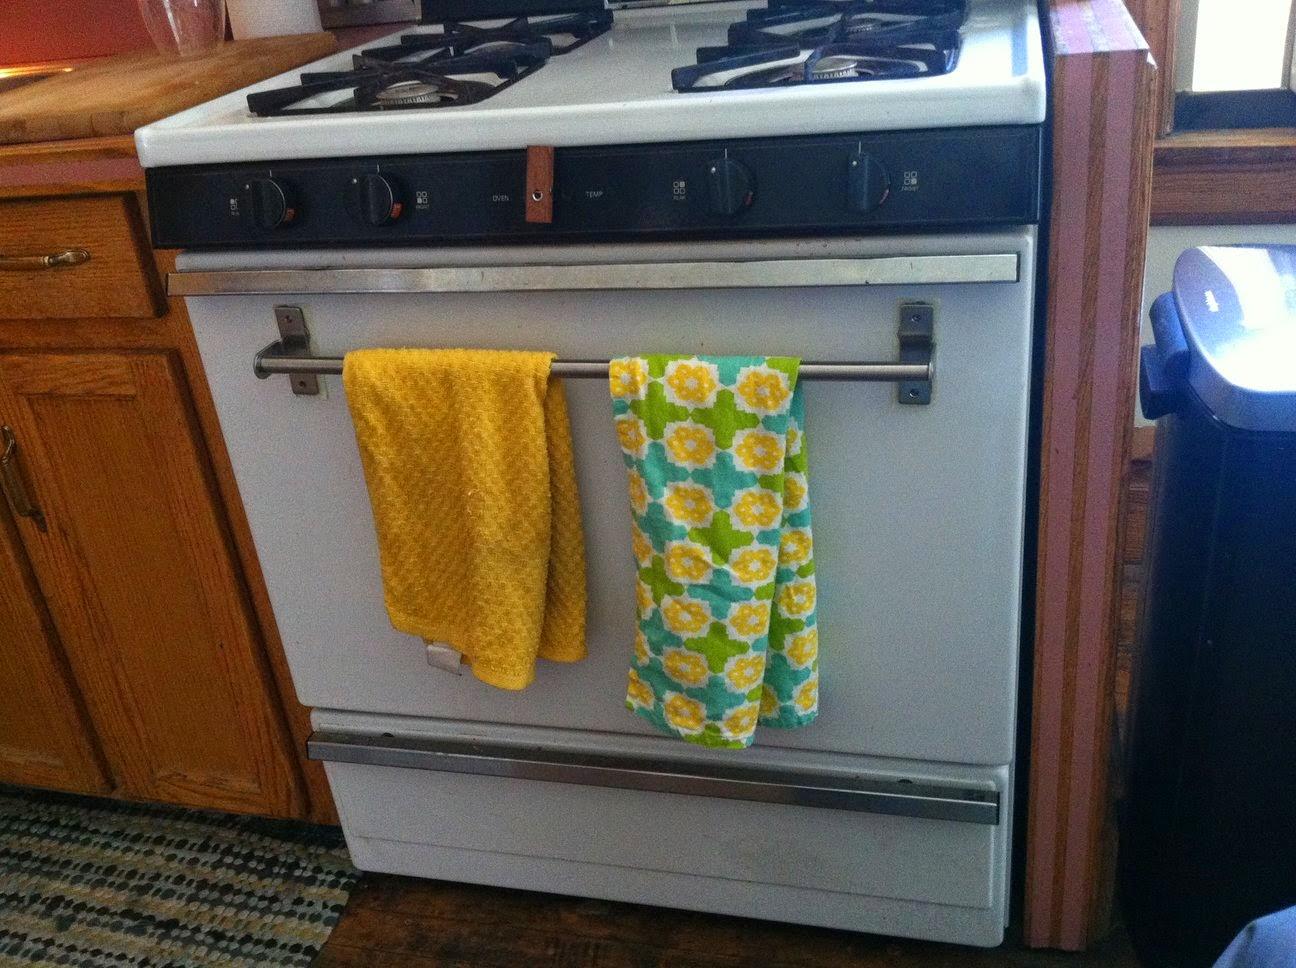 Grundtal magnetic towel rack ikea hackers for Ikea towel stand